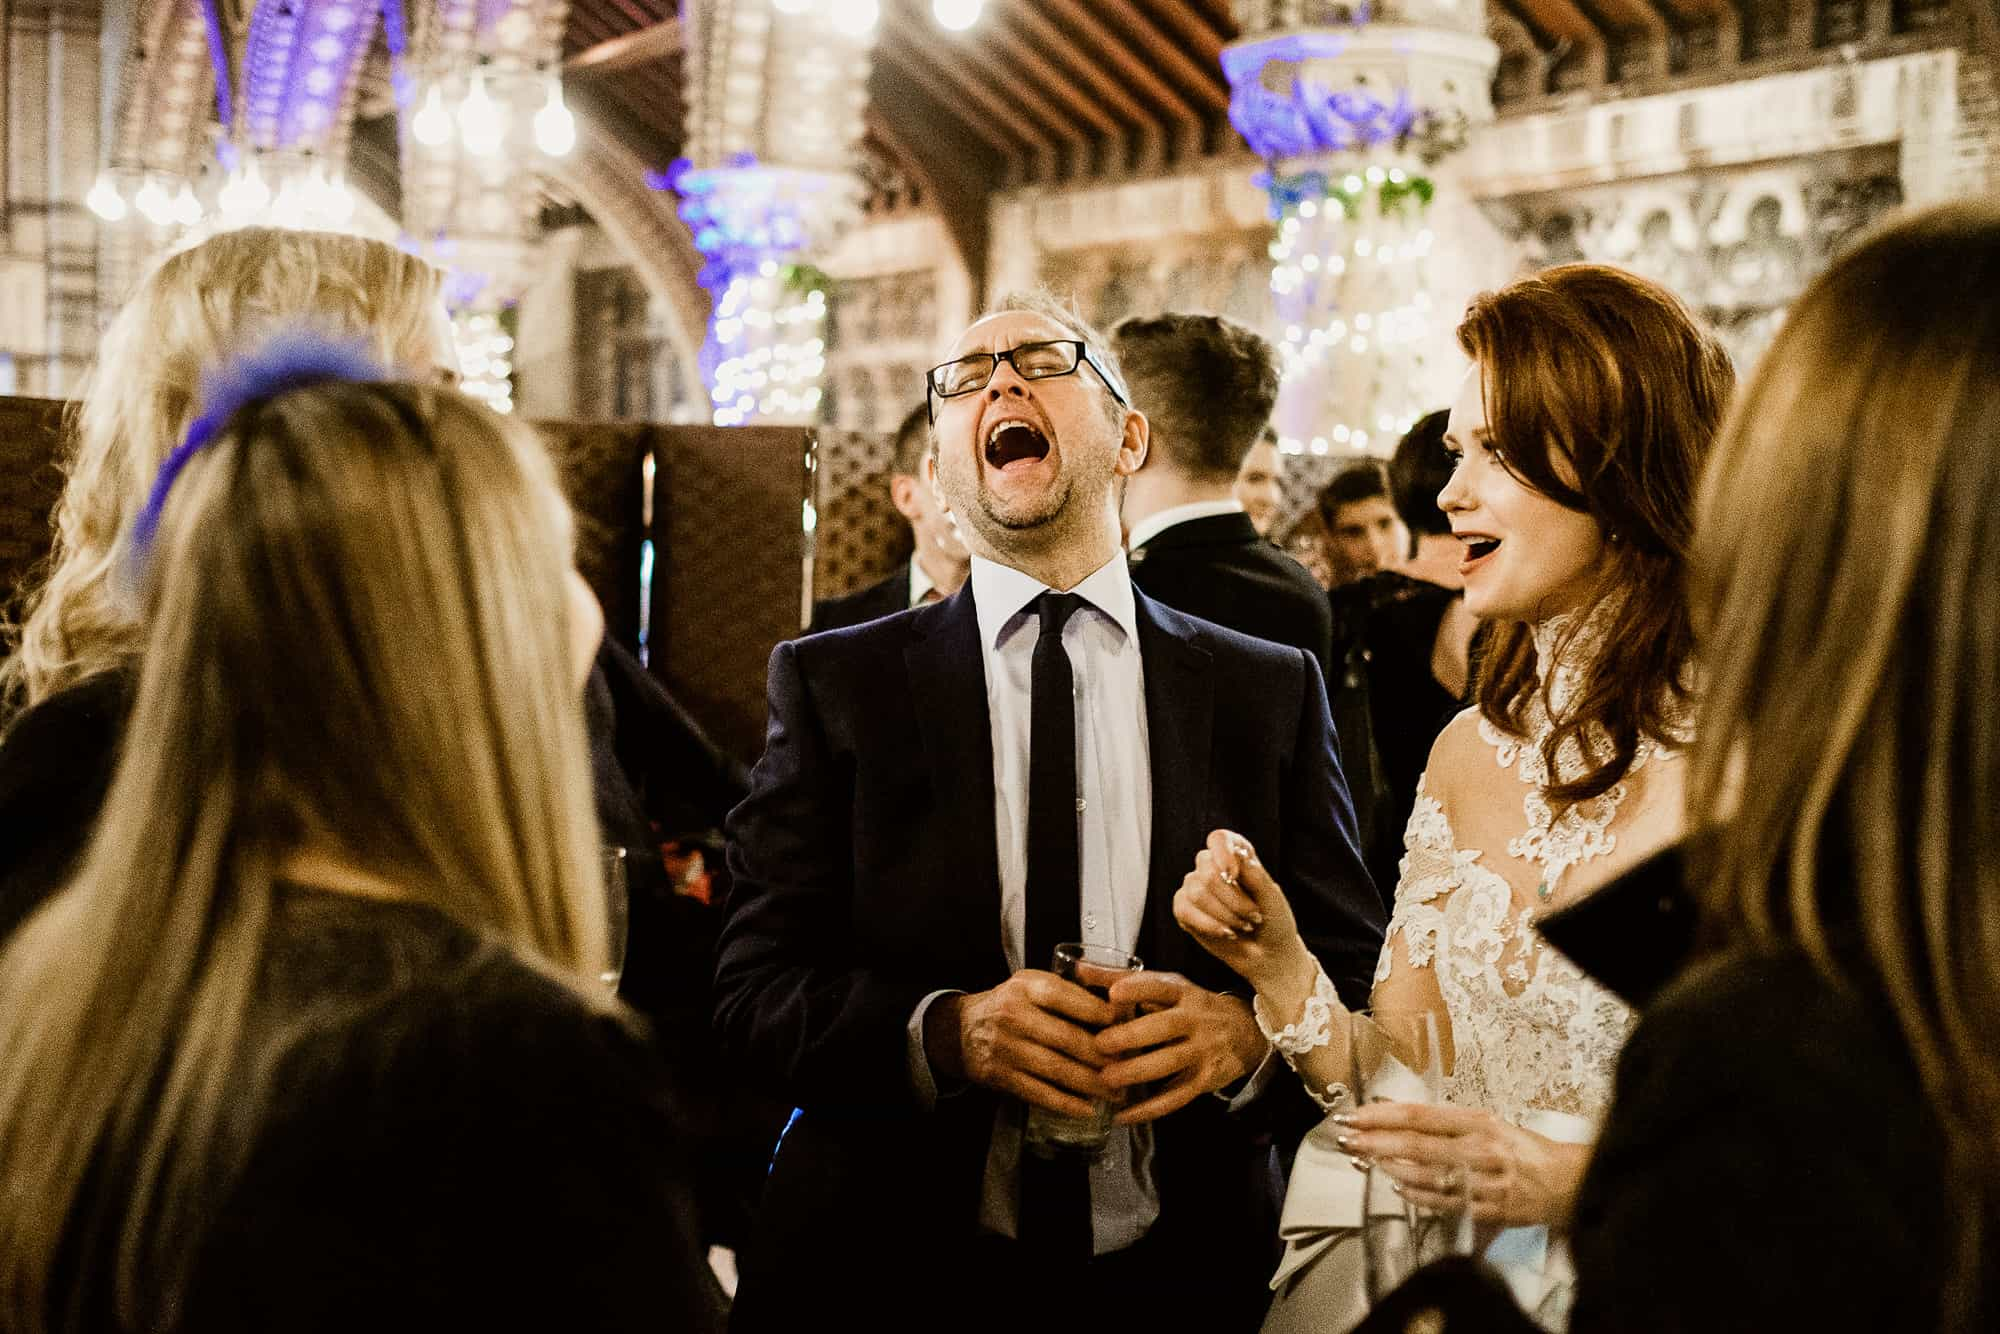 st-stephens-wedding-photographer-matt-tyler-0042